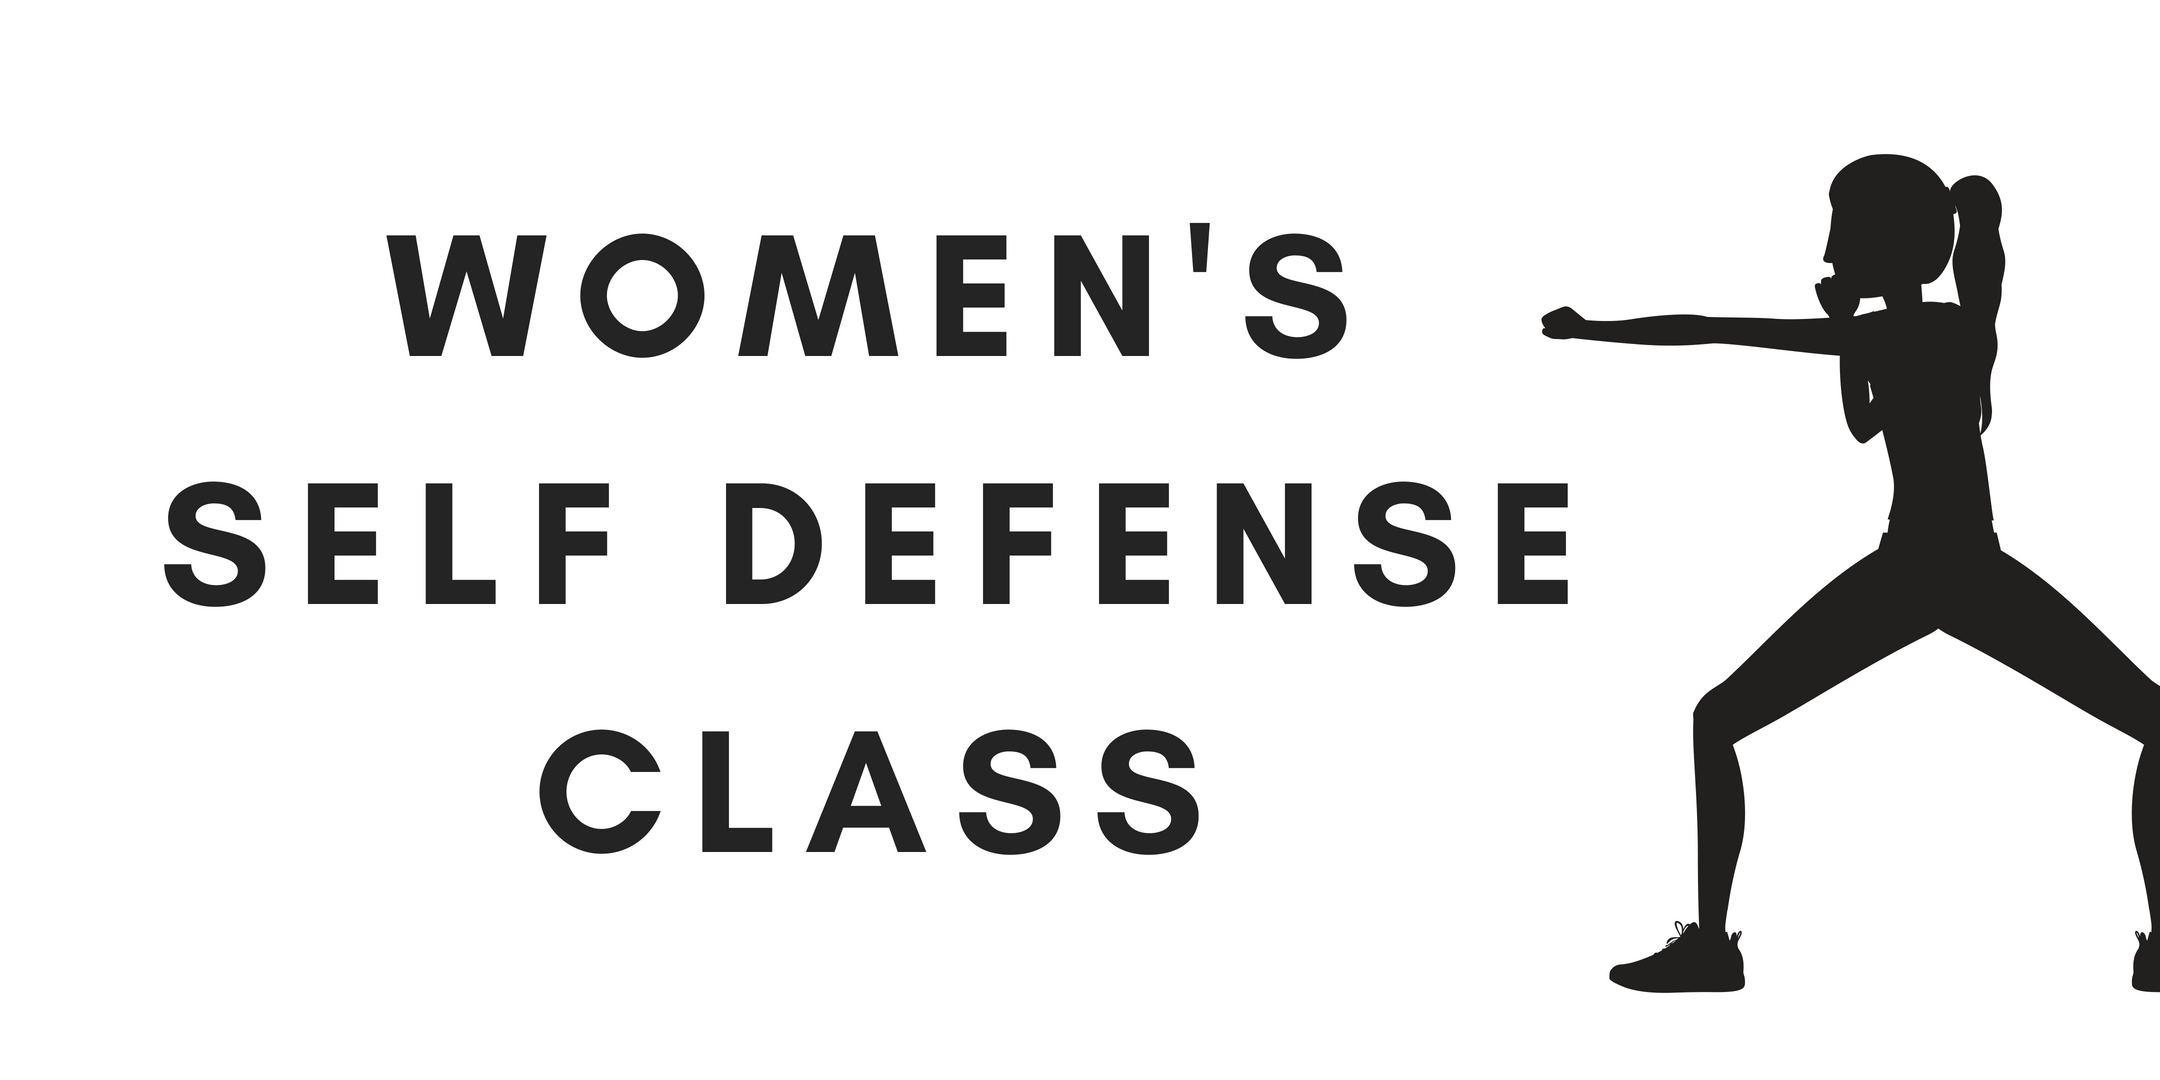 Women's Self Defense Class | October 16 & 17 | Around